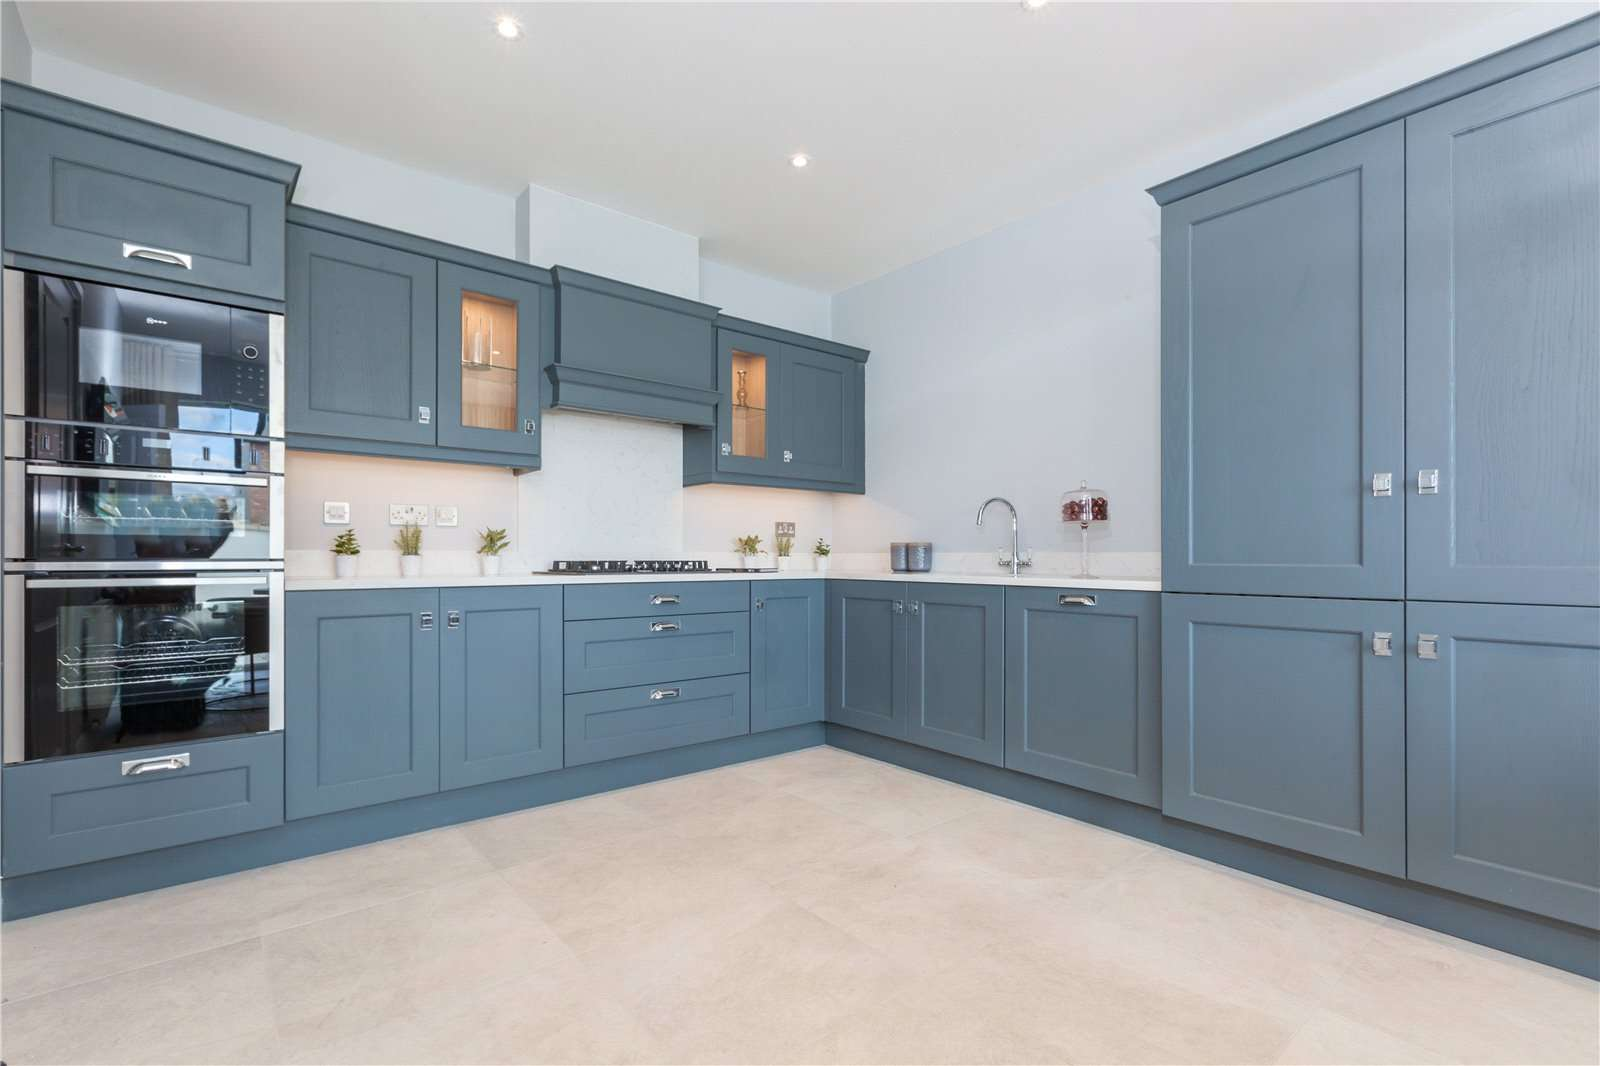 Savills | Property for sale in Dublin, Ireland